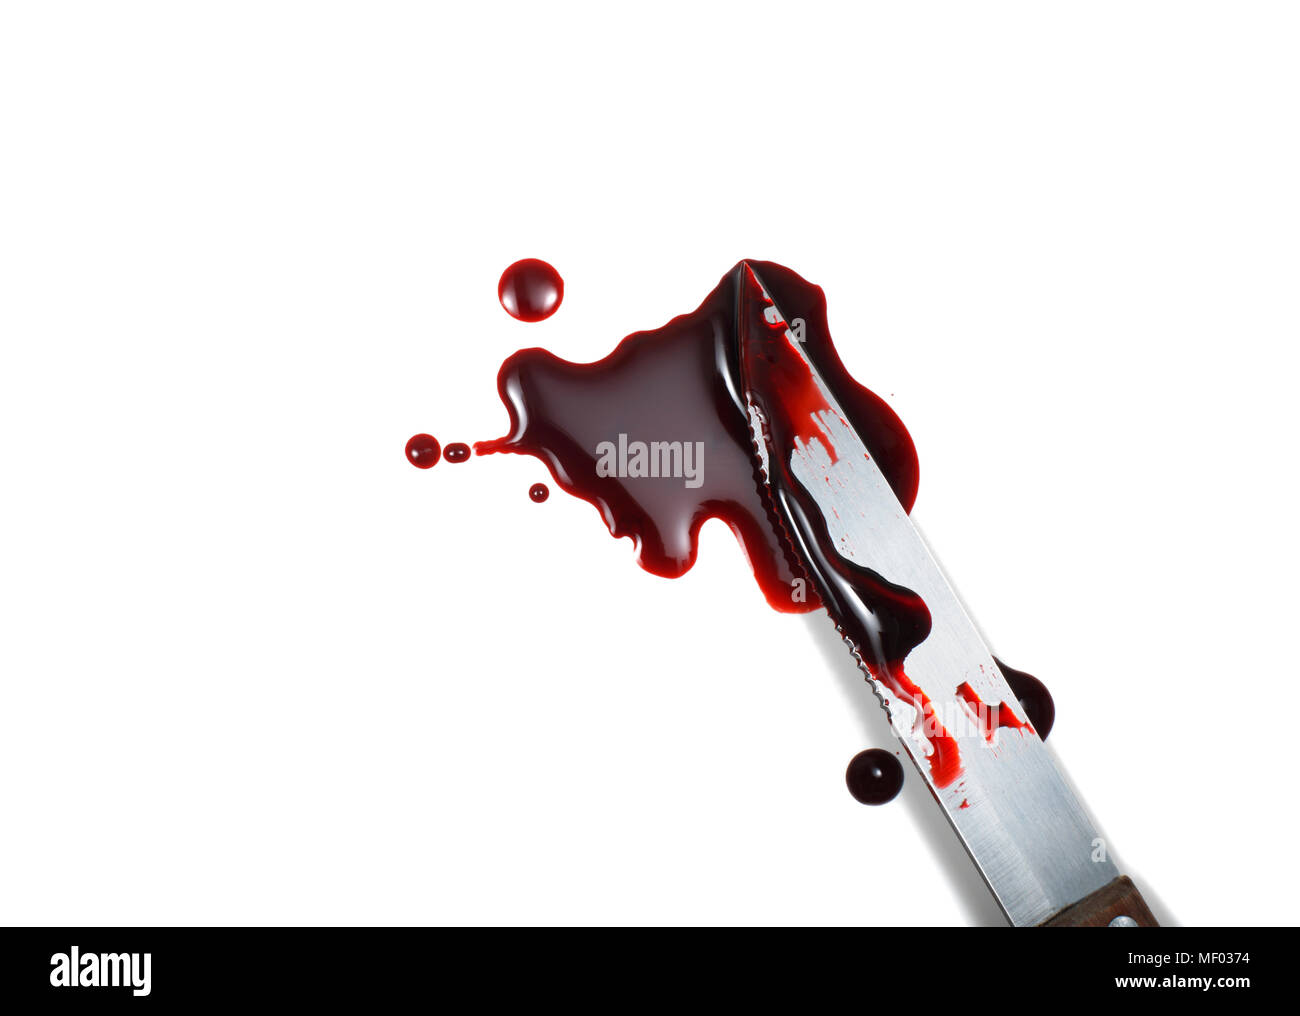 Bloody Knife on White Background - Stock Image